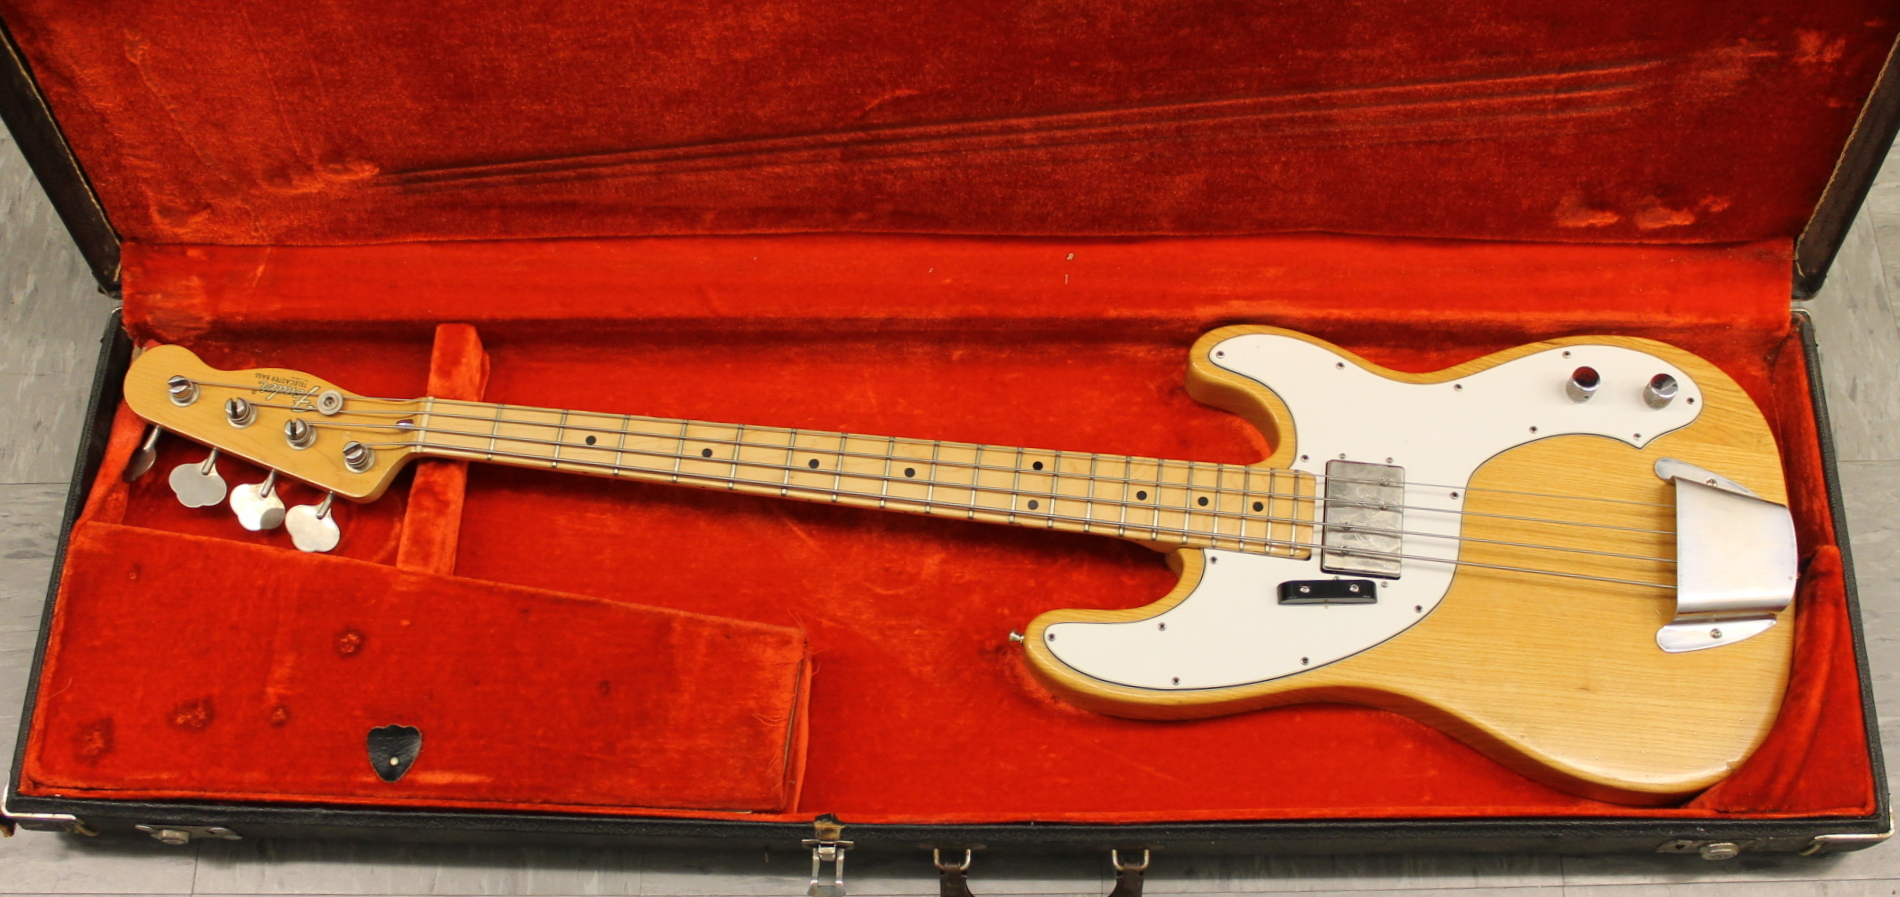 fender telecaster bass 1972 bass for sale kitarakuu. Black Bedroom Furniture Sets. Home Design Ideas